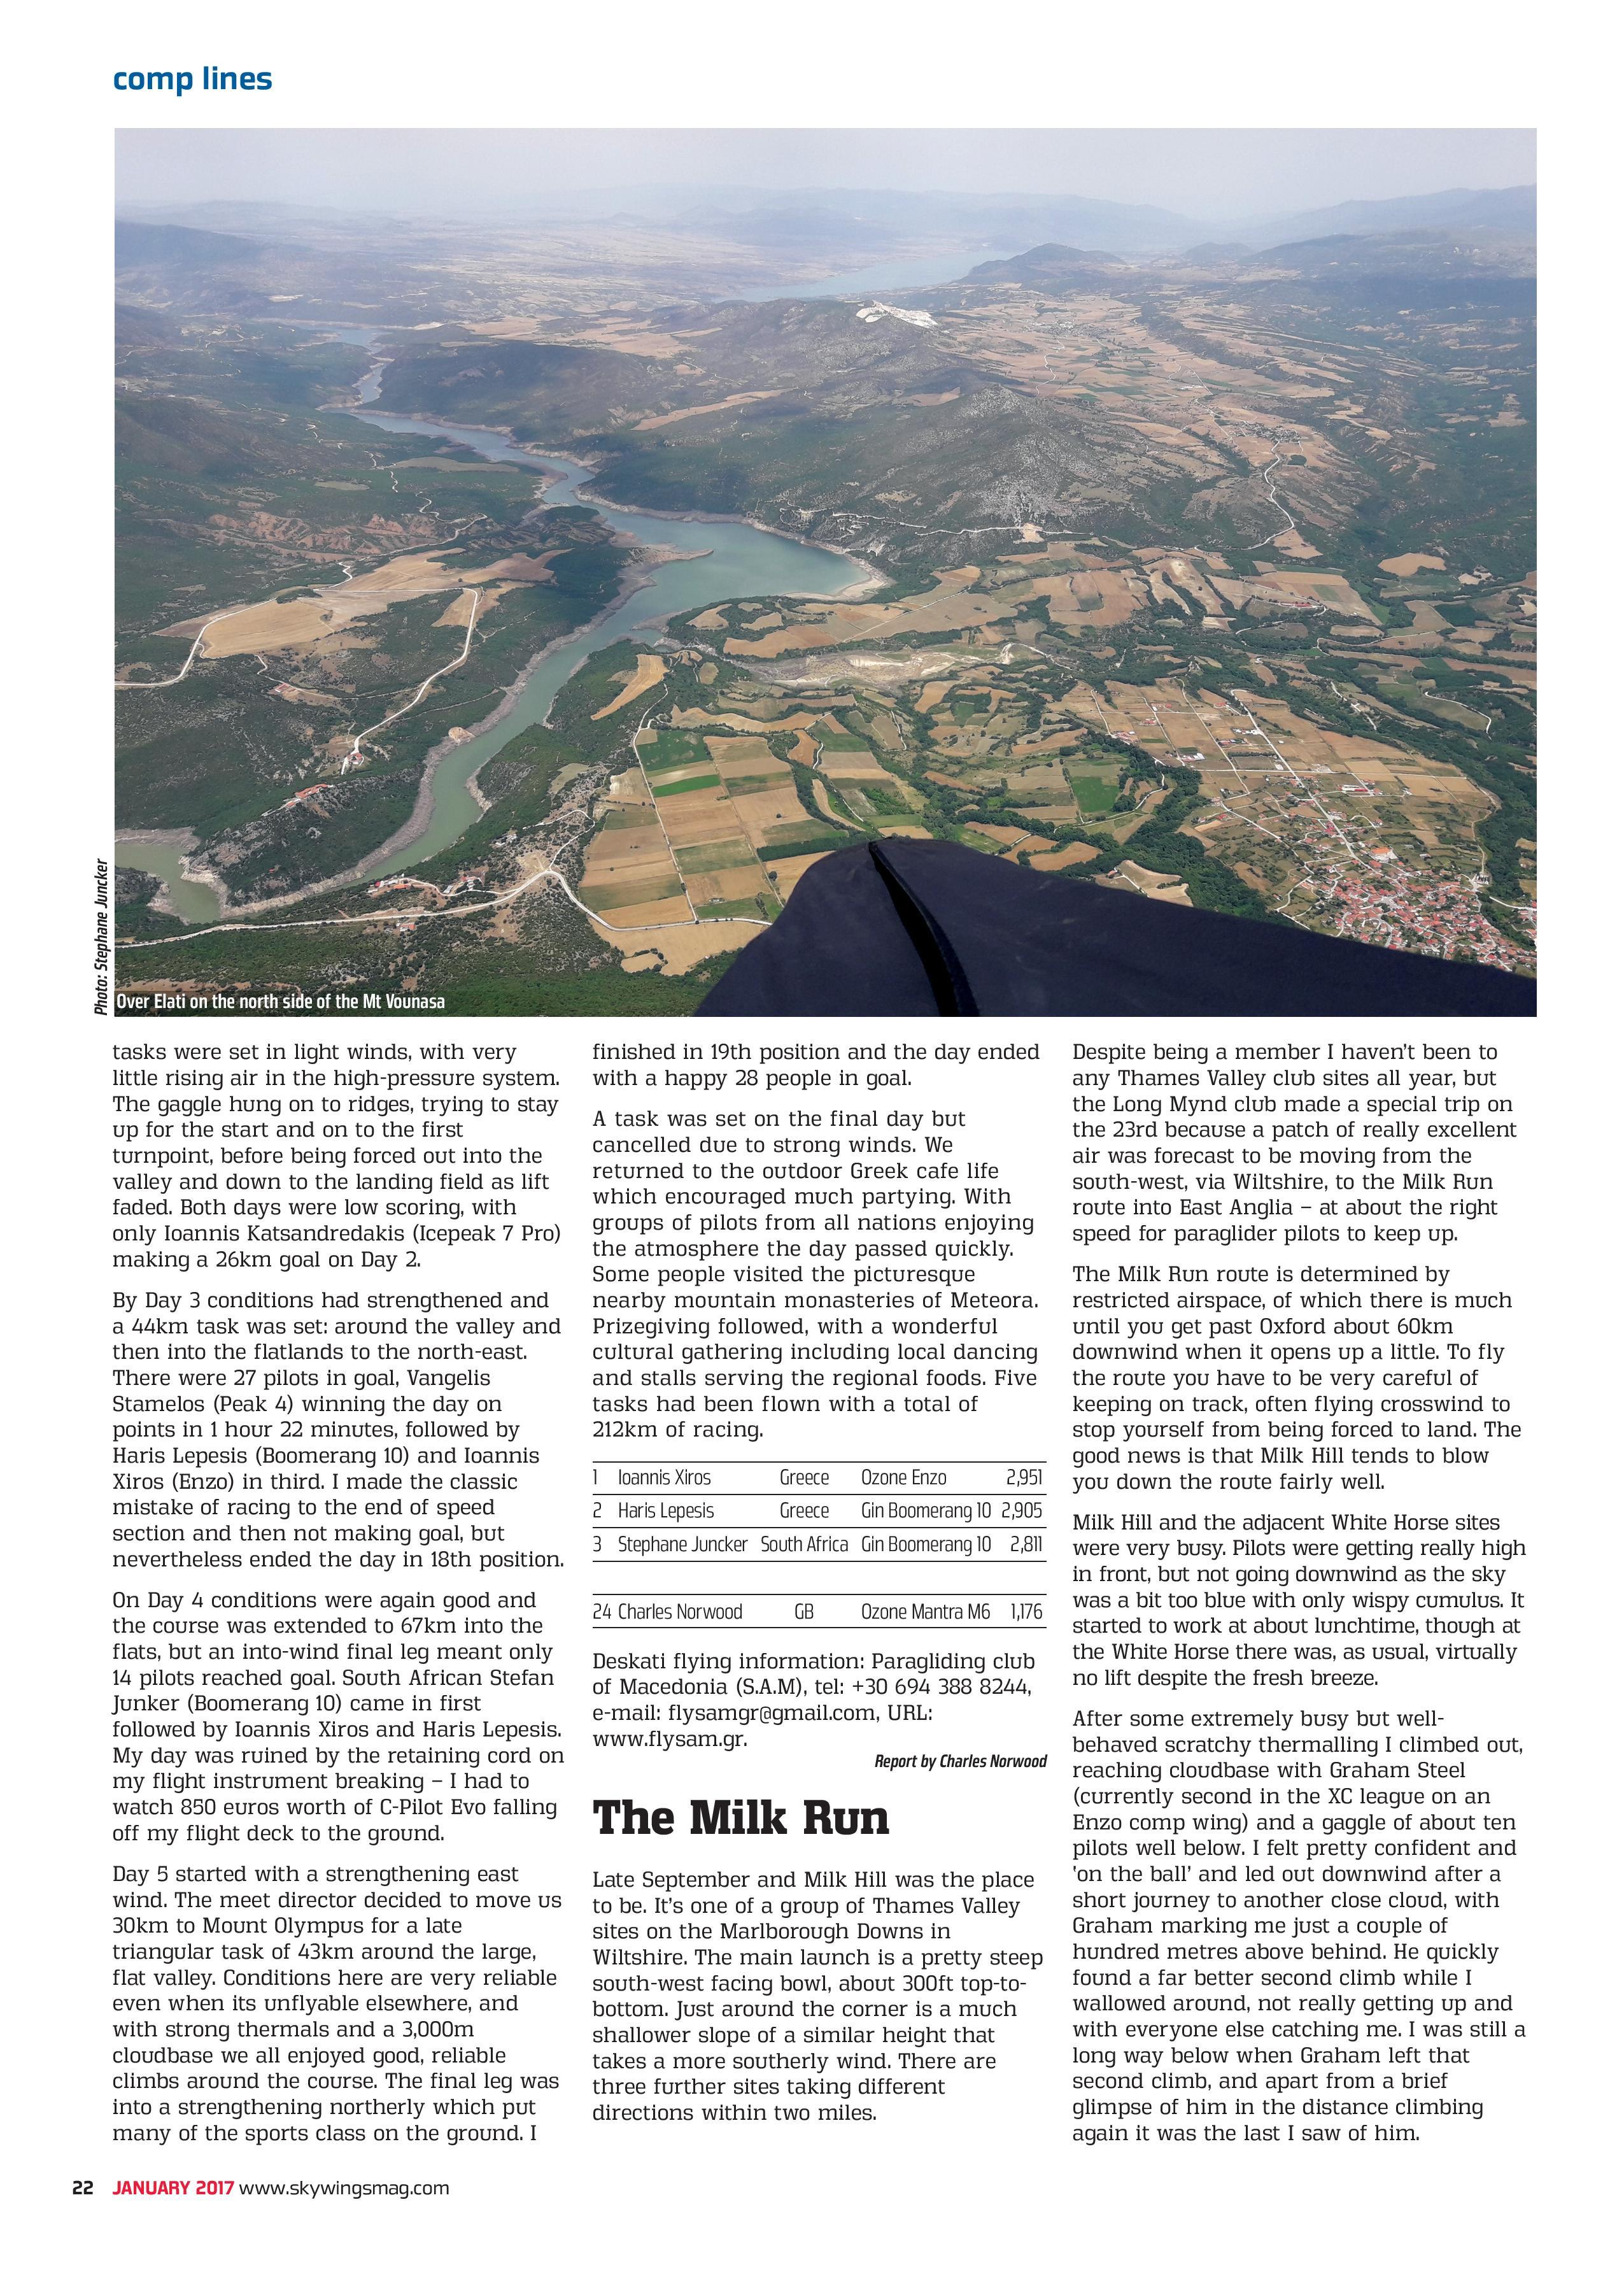 Skywings Deskati-page-003